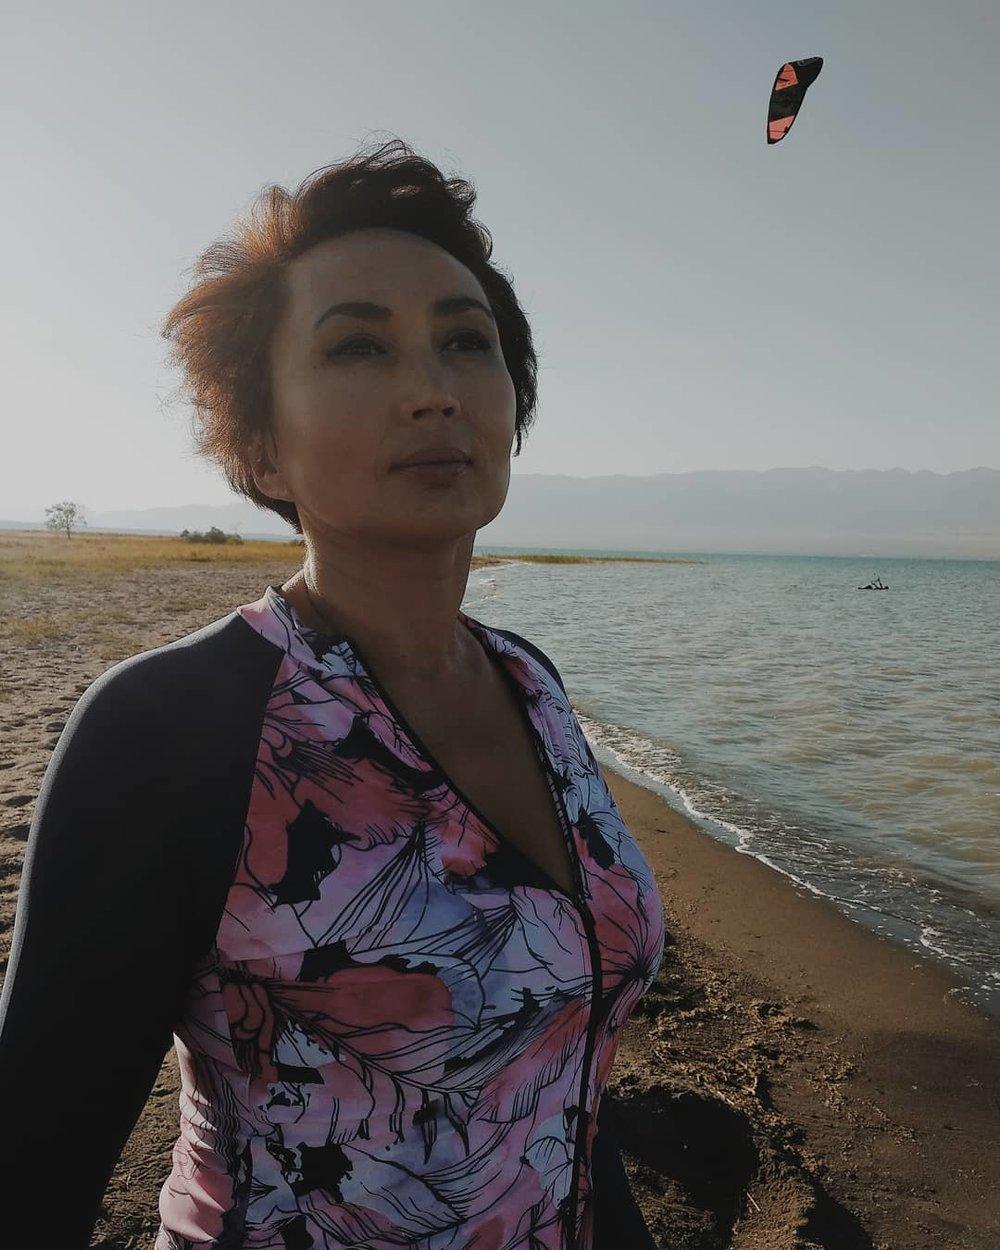 cholpon-daniyarova-sheisnomad.jpg